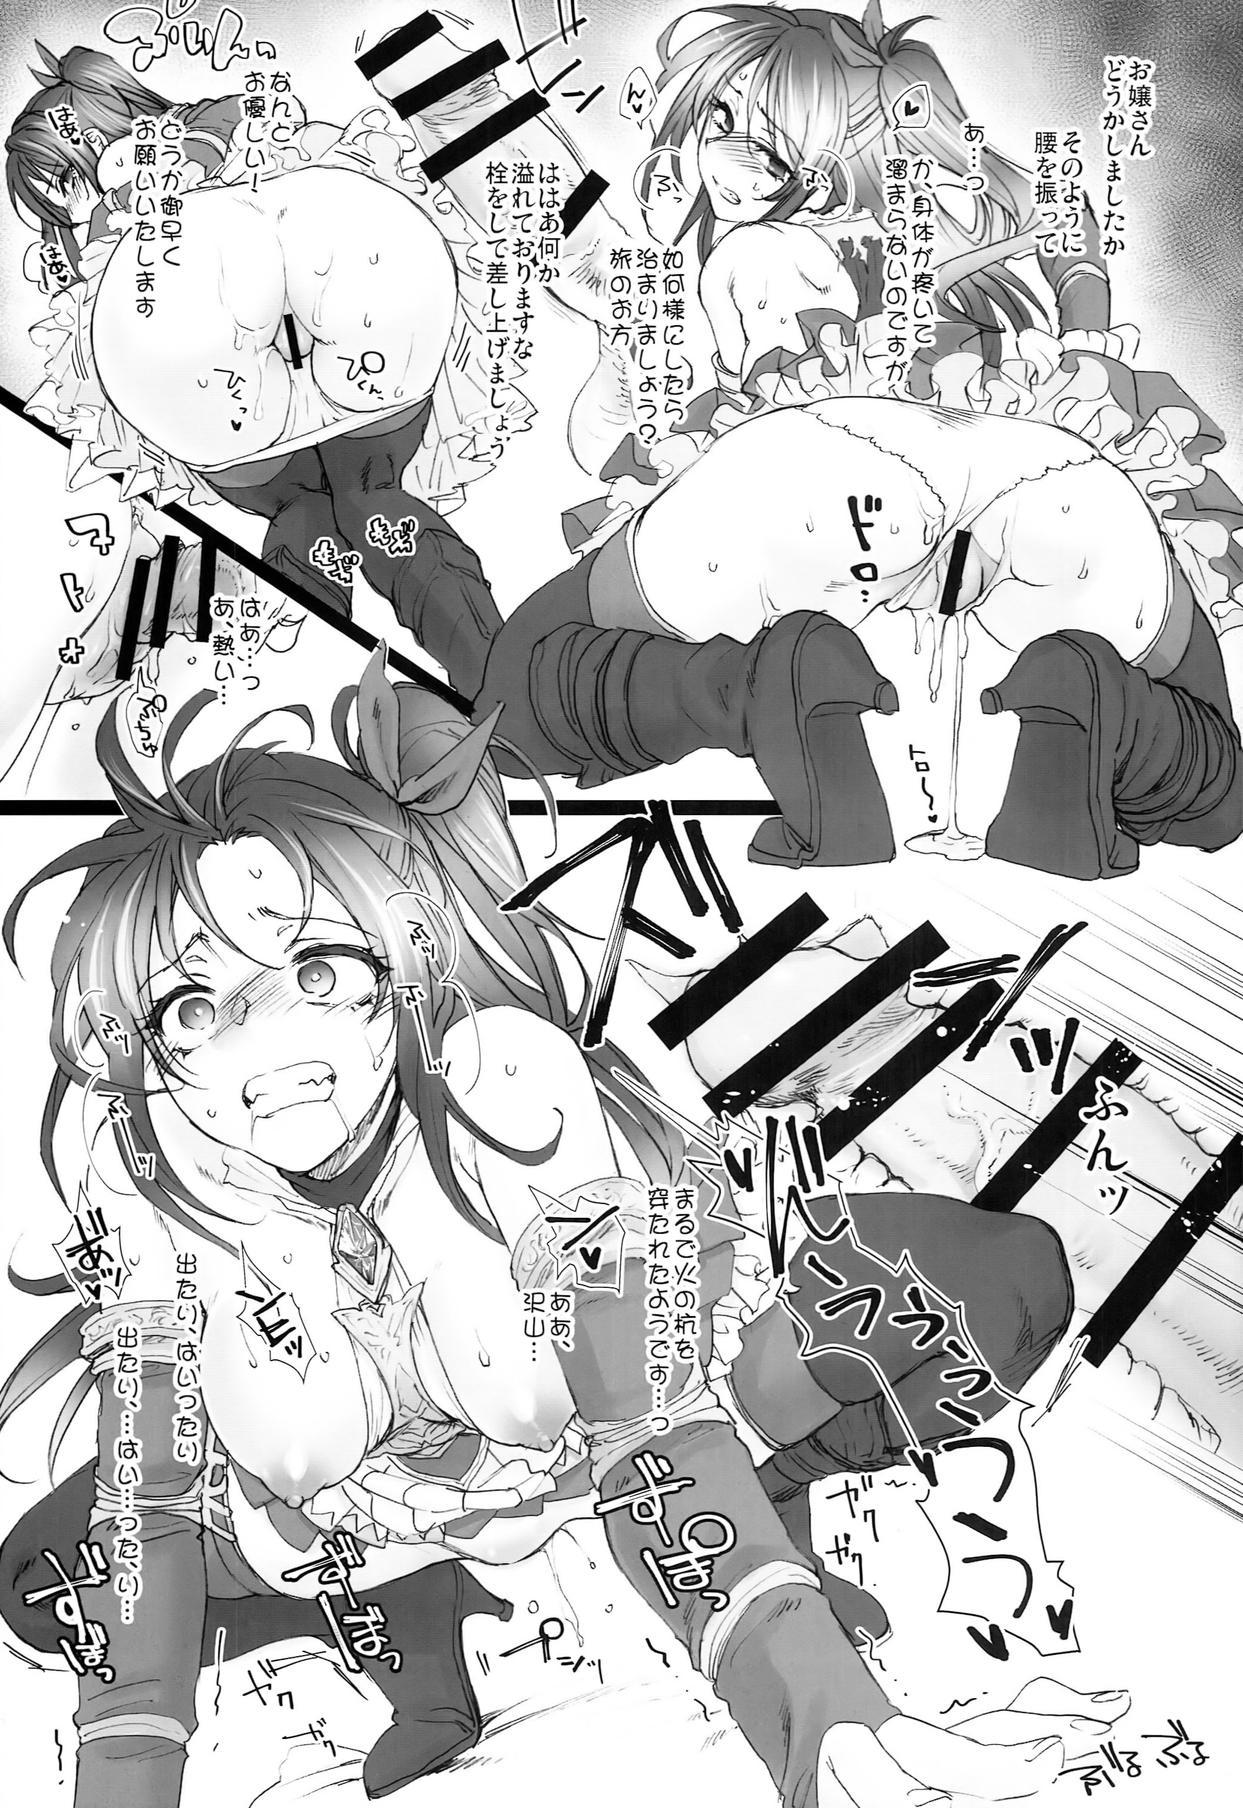 (COMIC1☆8) [Hisagoya (Momio,Miyamoto Issa,Shoukaki)] Gakuen wo Sukutta Kimo-ota Kishi sama ga Bisyoujo Ryu-musume to Ecchi na Koto suru Hon (Rage of Bahamut) 22